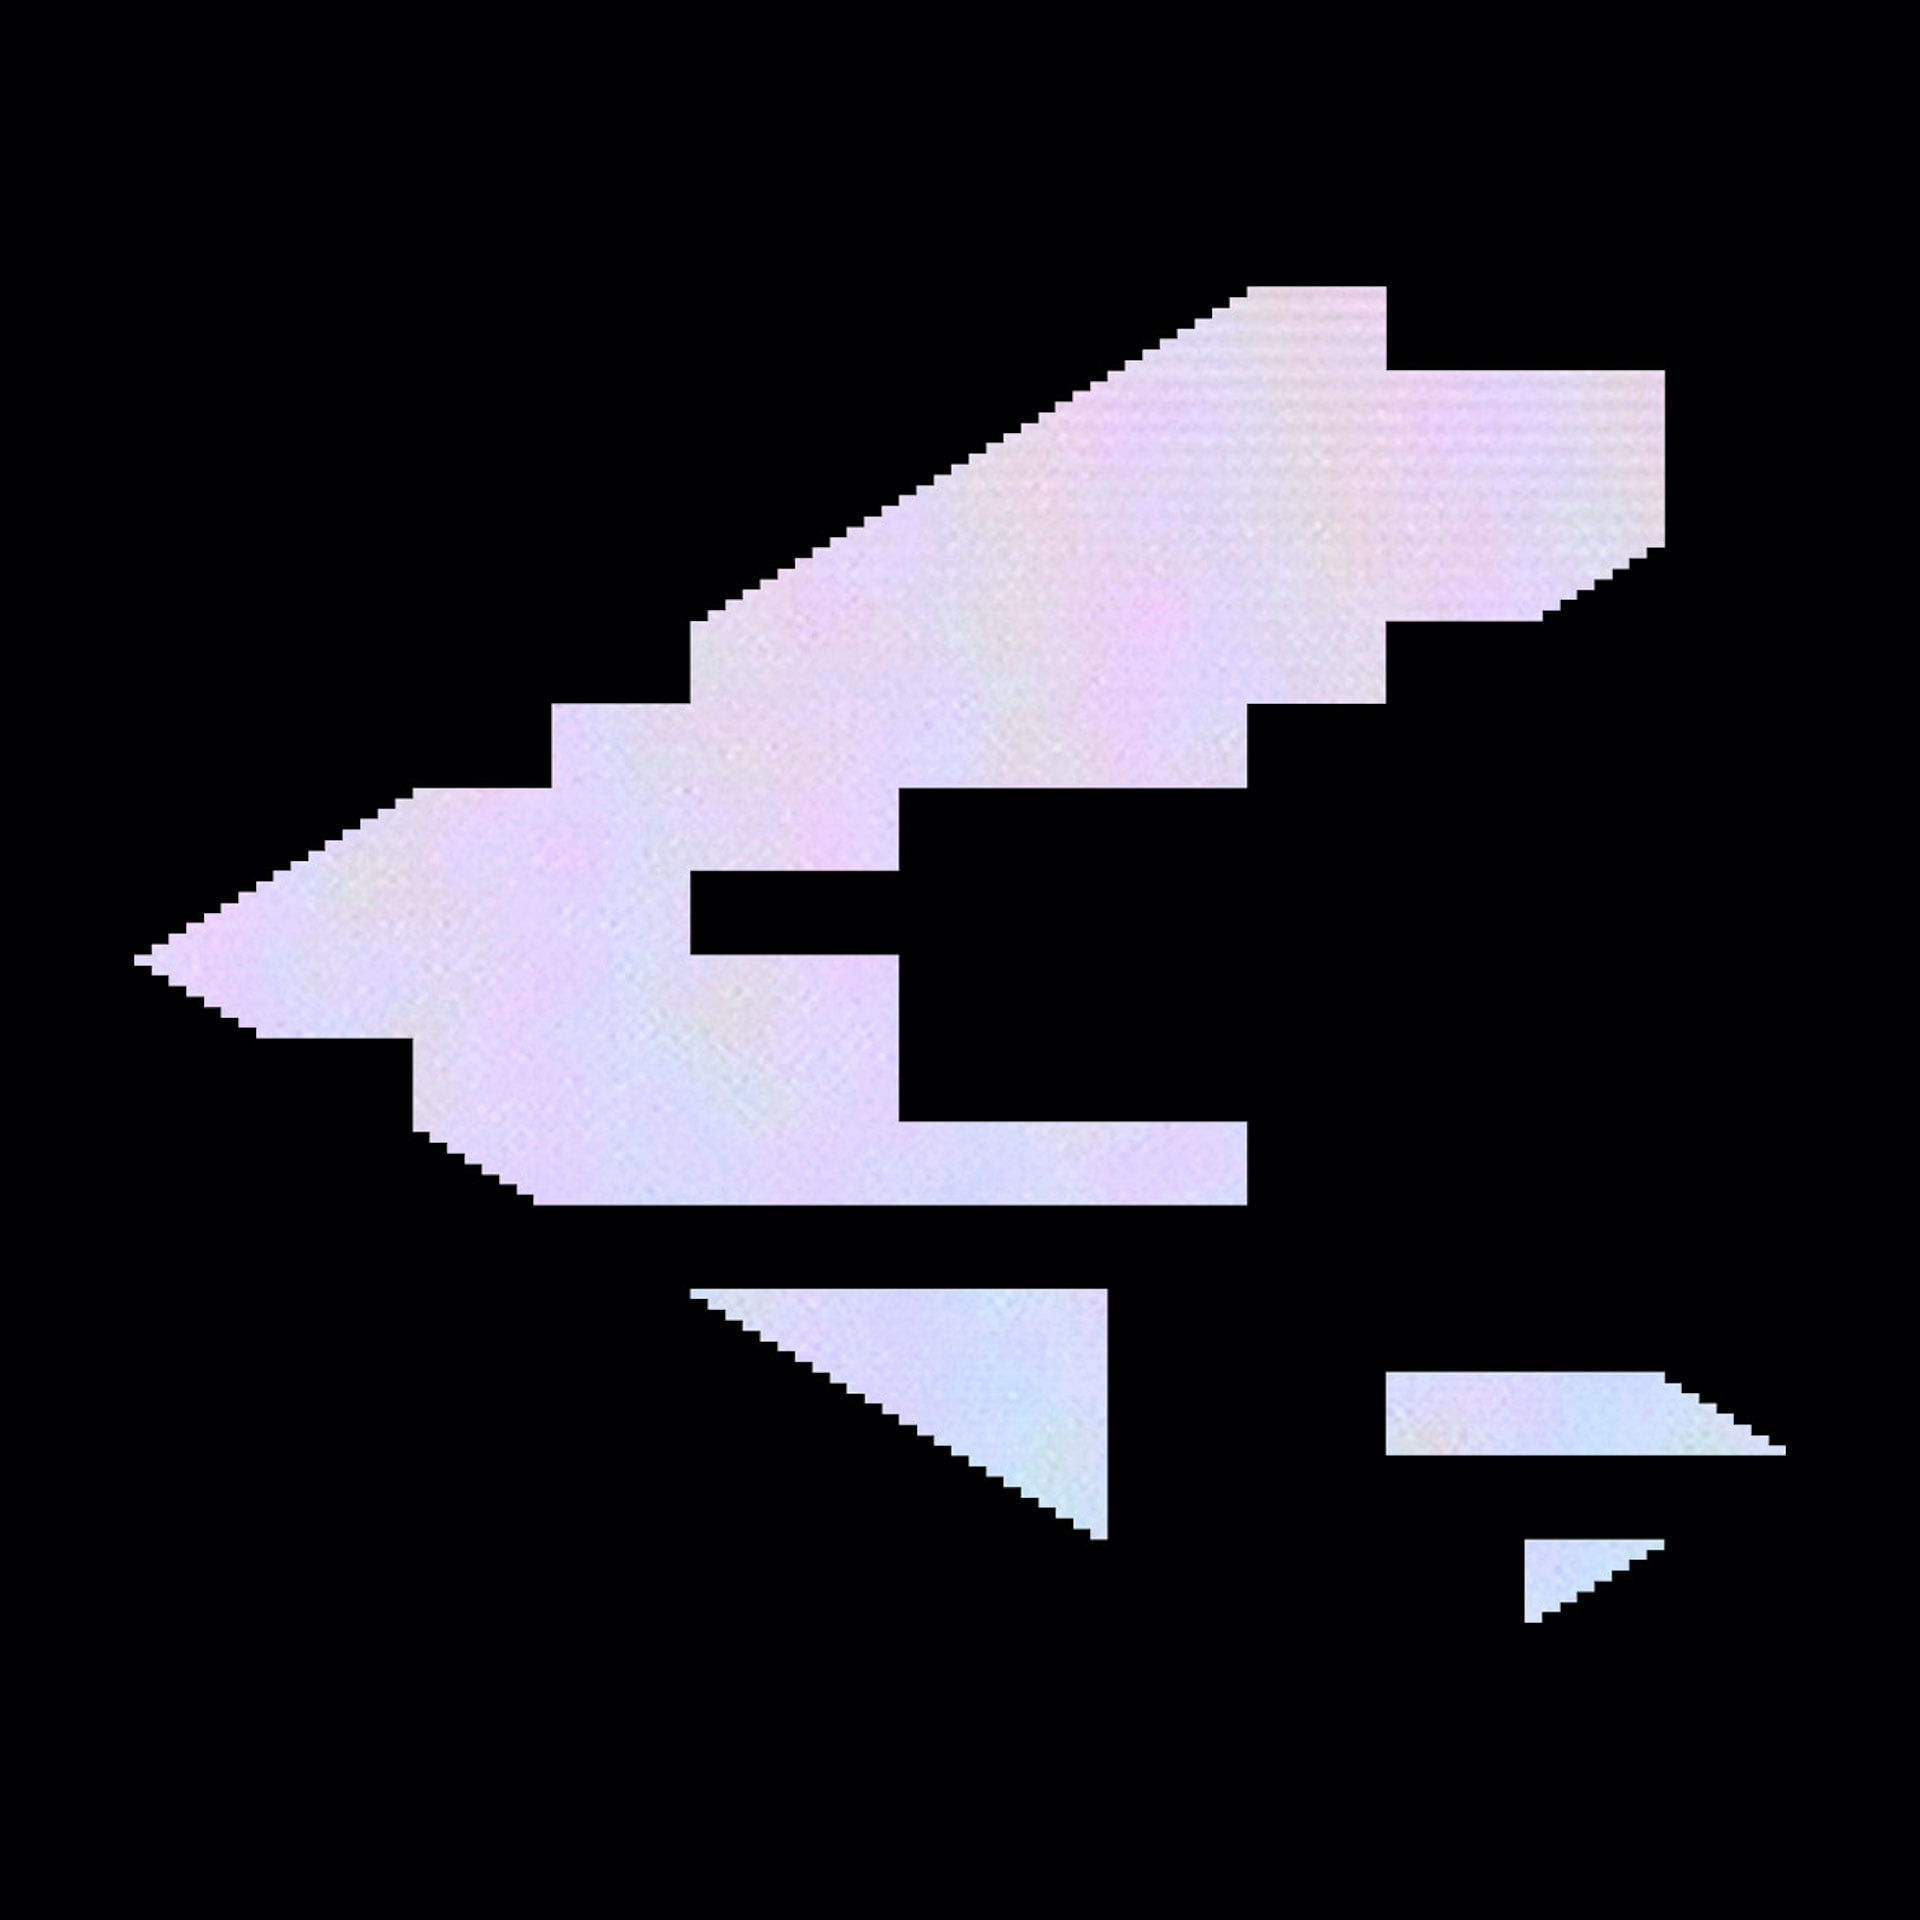 Squarepusherが機材を弄り倒す!スタジオセッション「Acid Furlough」の映像が公開&最新ツアーグッズが追加発売 music200518_squarepusher_video4-1920x1920